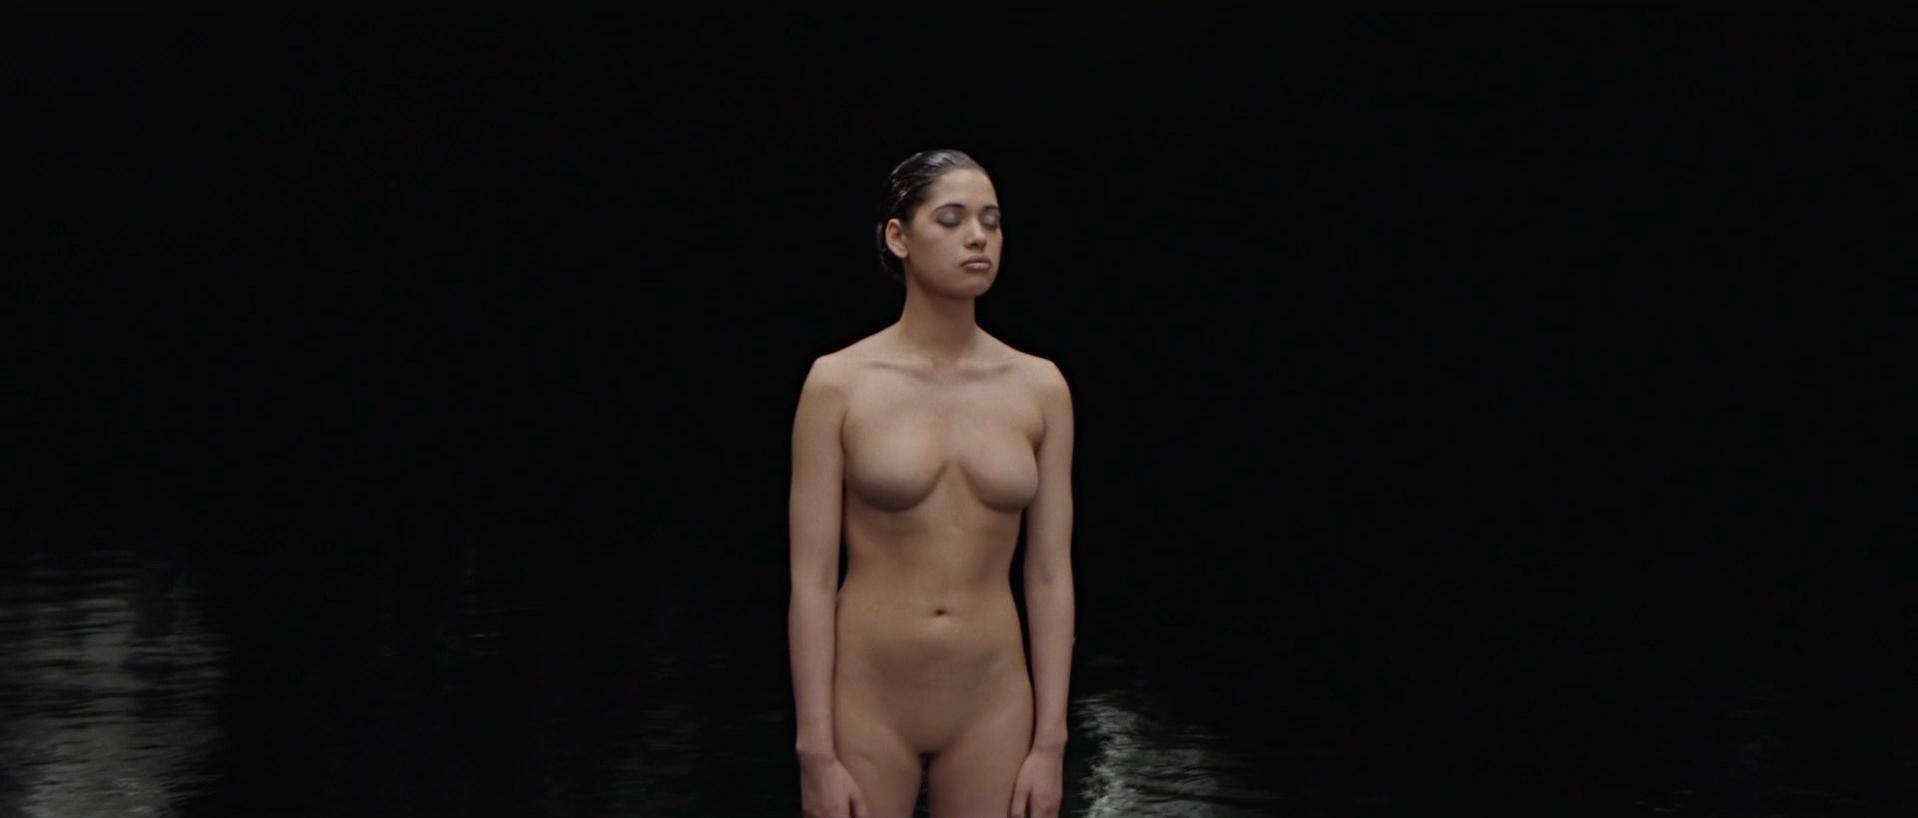 Nude sex open wide